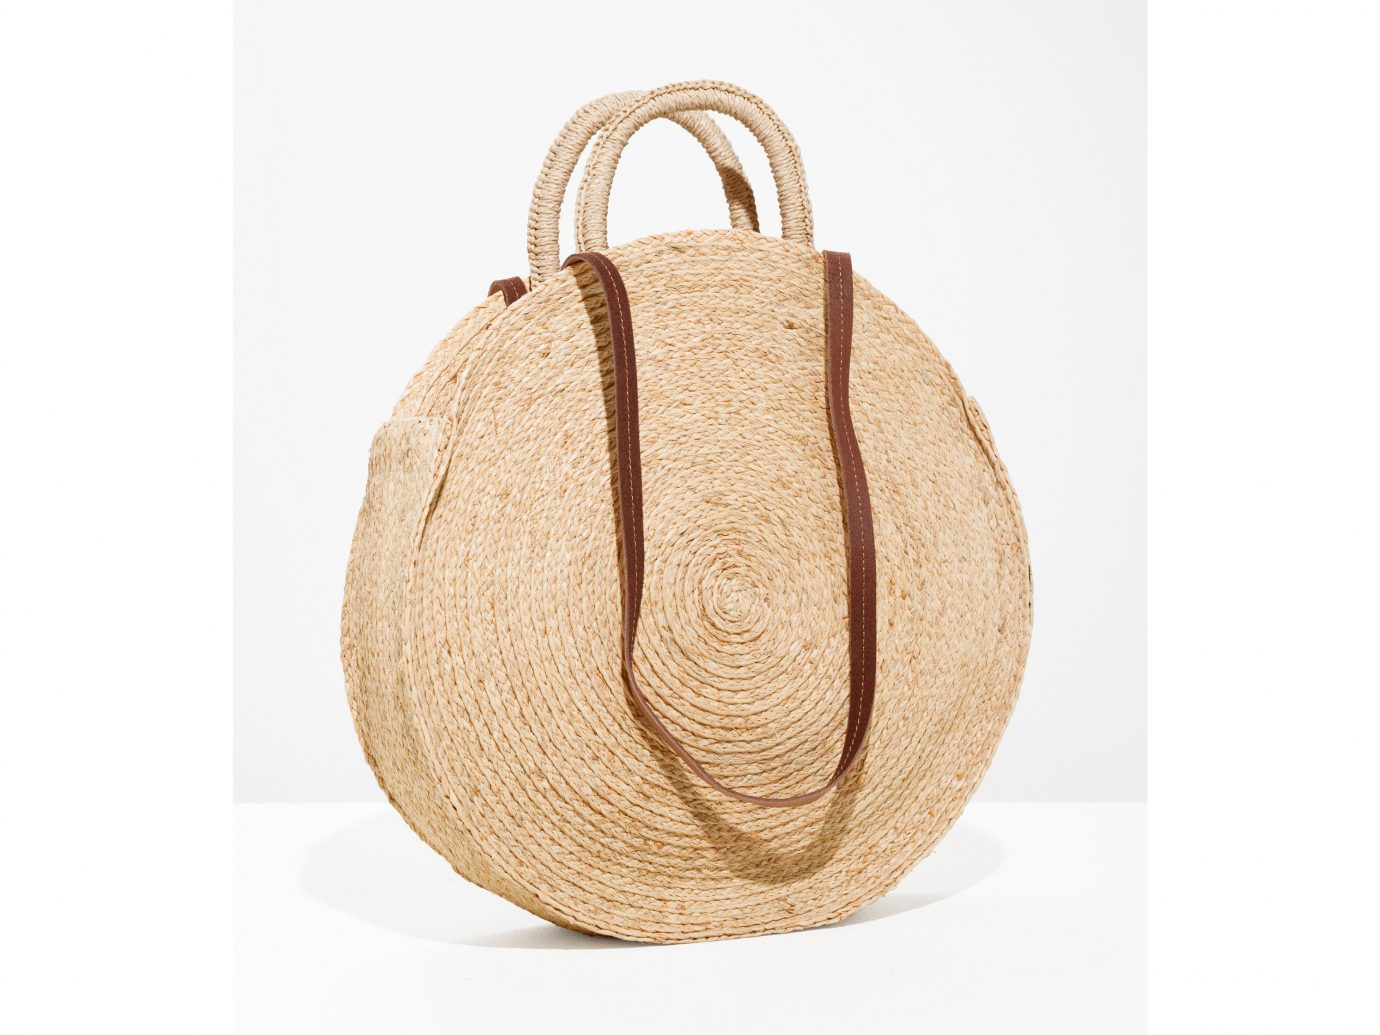 Spring Travel Style + Design Summer Travel Travel Lifestyle Travel Shop beige product design product basket bag accessory